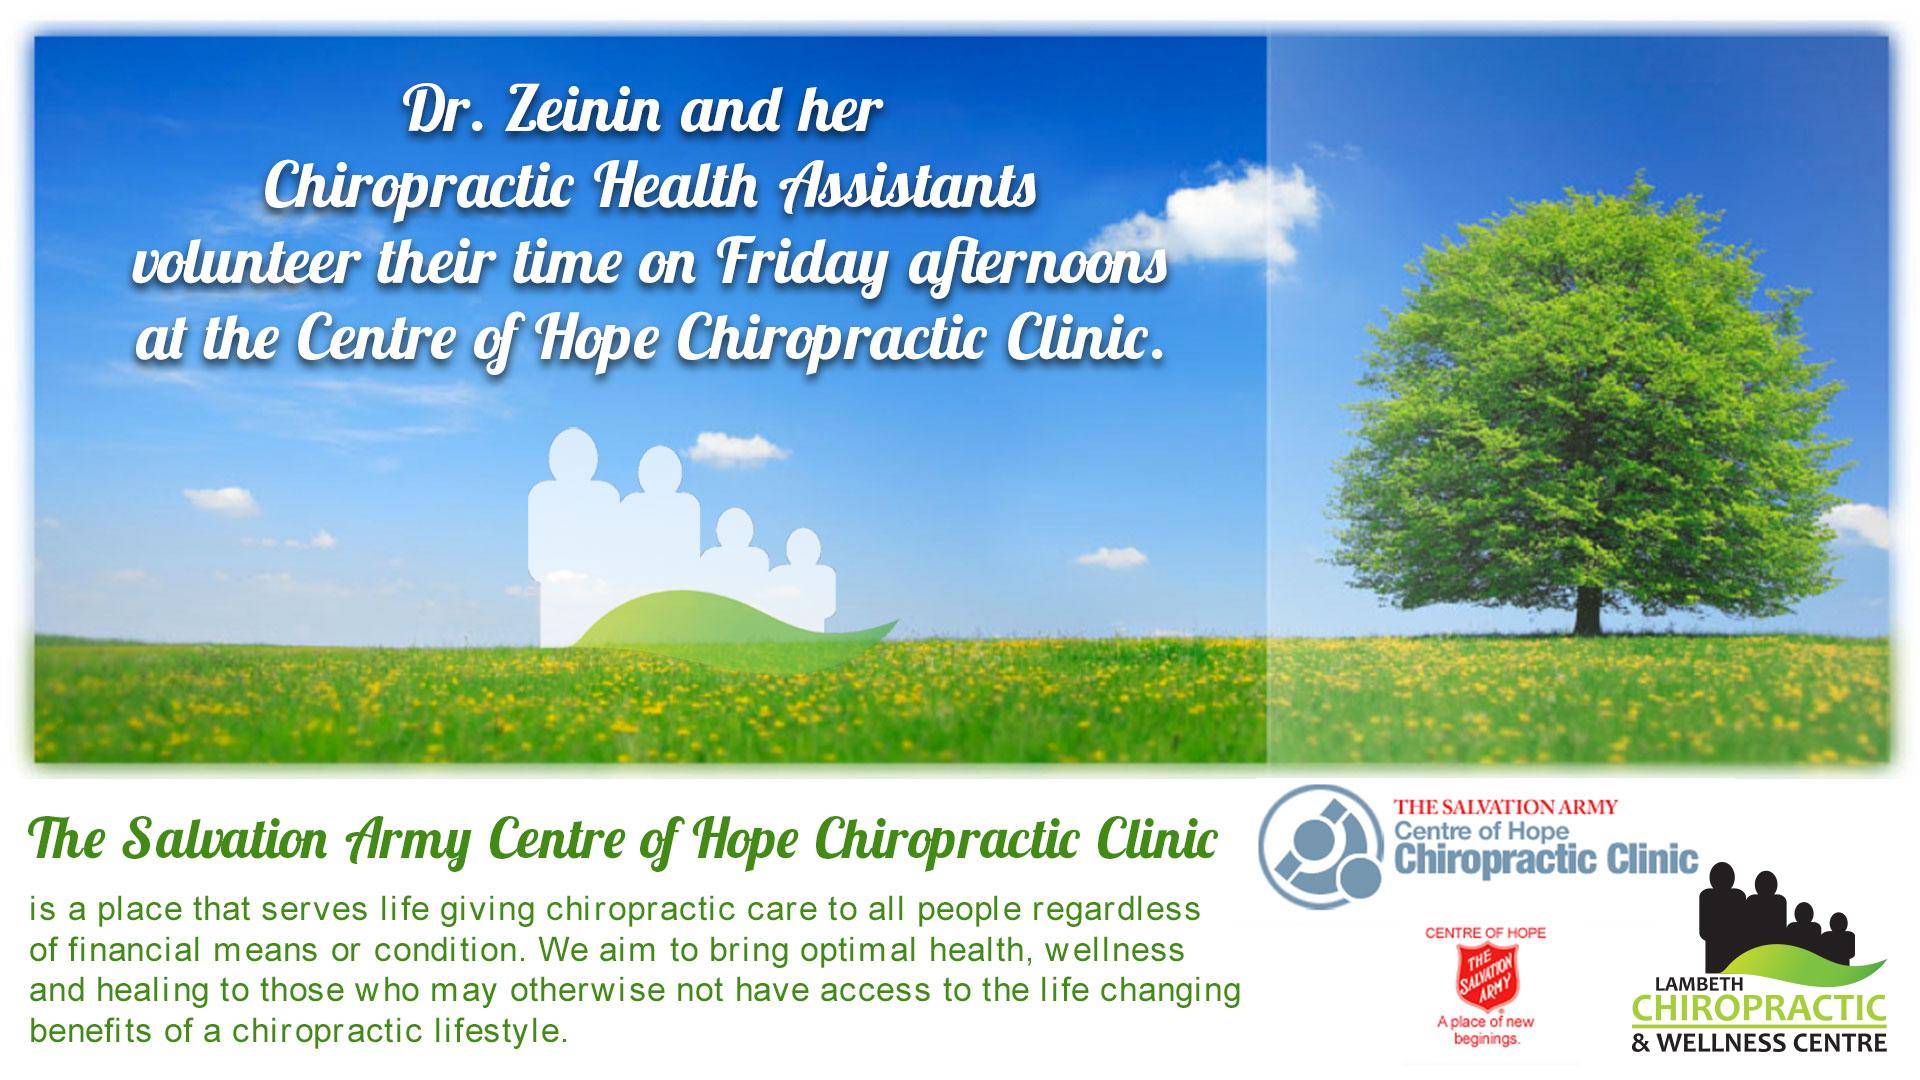 Lambeth Chiropractic Wellness Centre